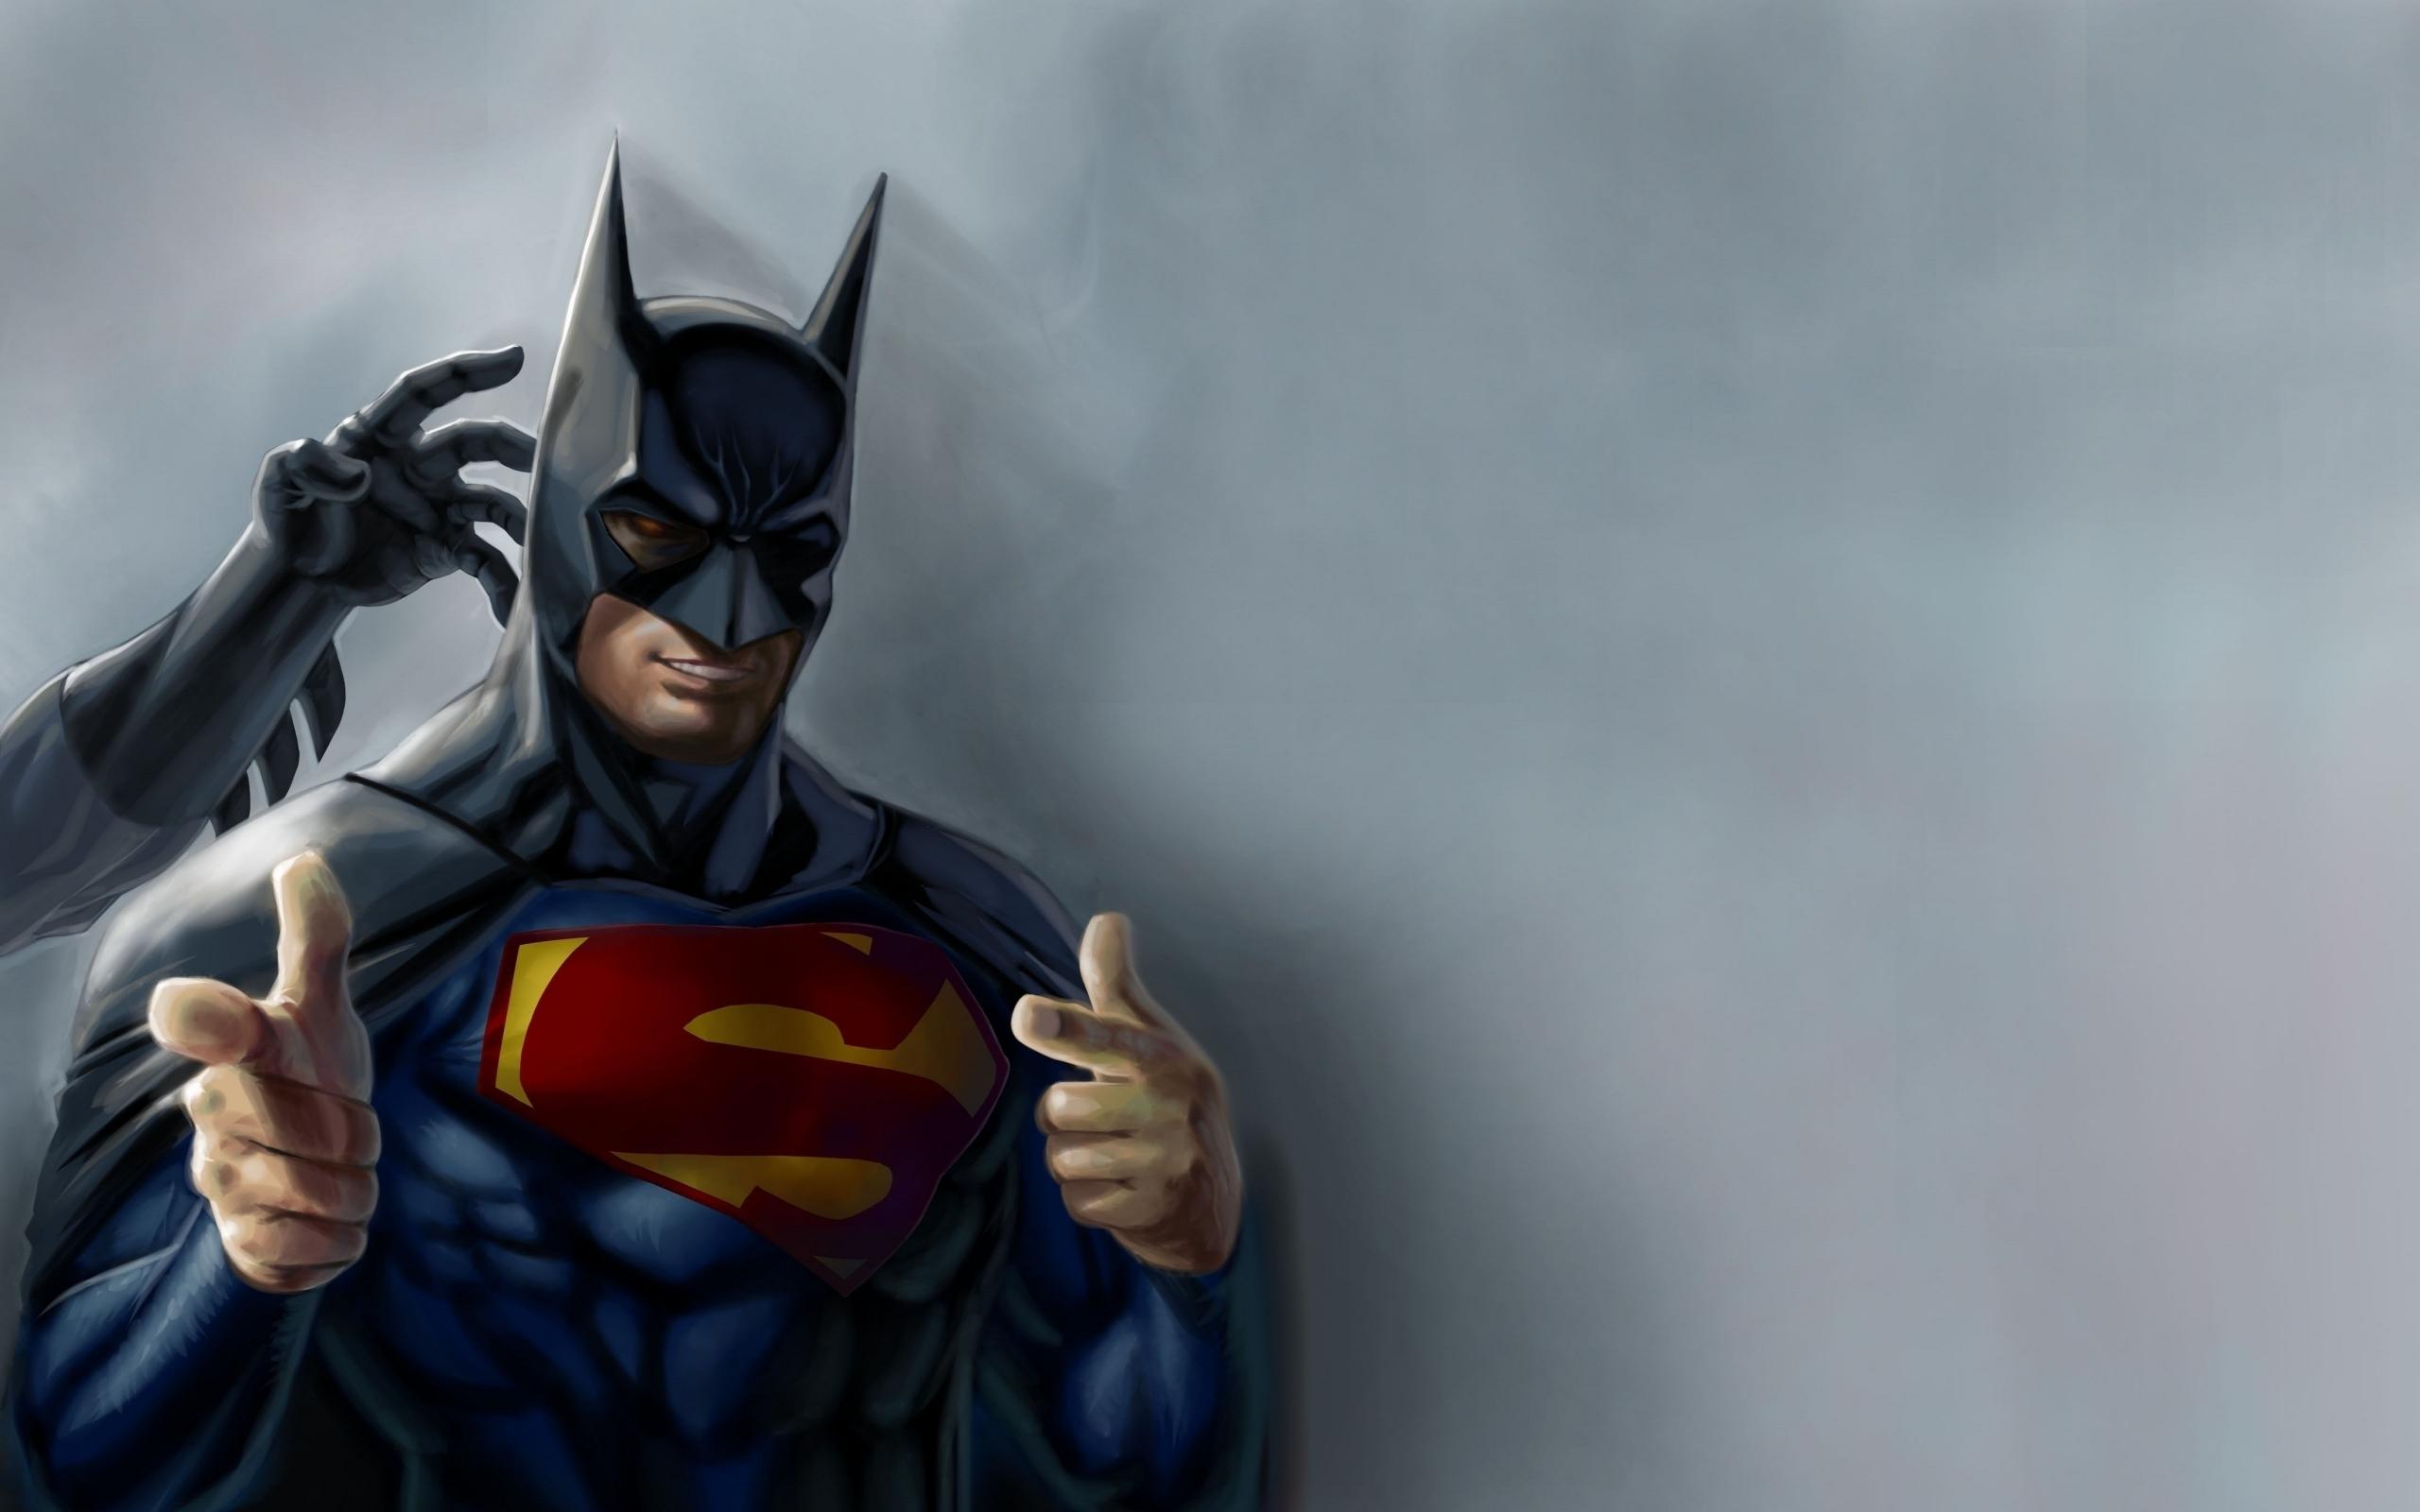 comics Batman hero supeman humor funny superhero wallpaper background 2560x1600